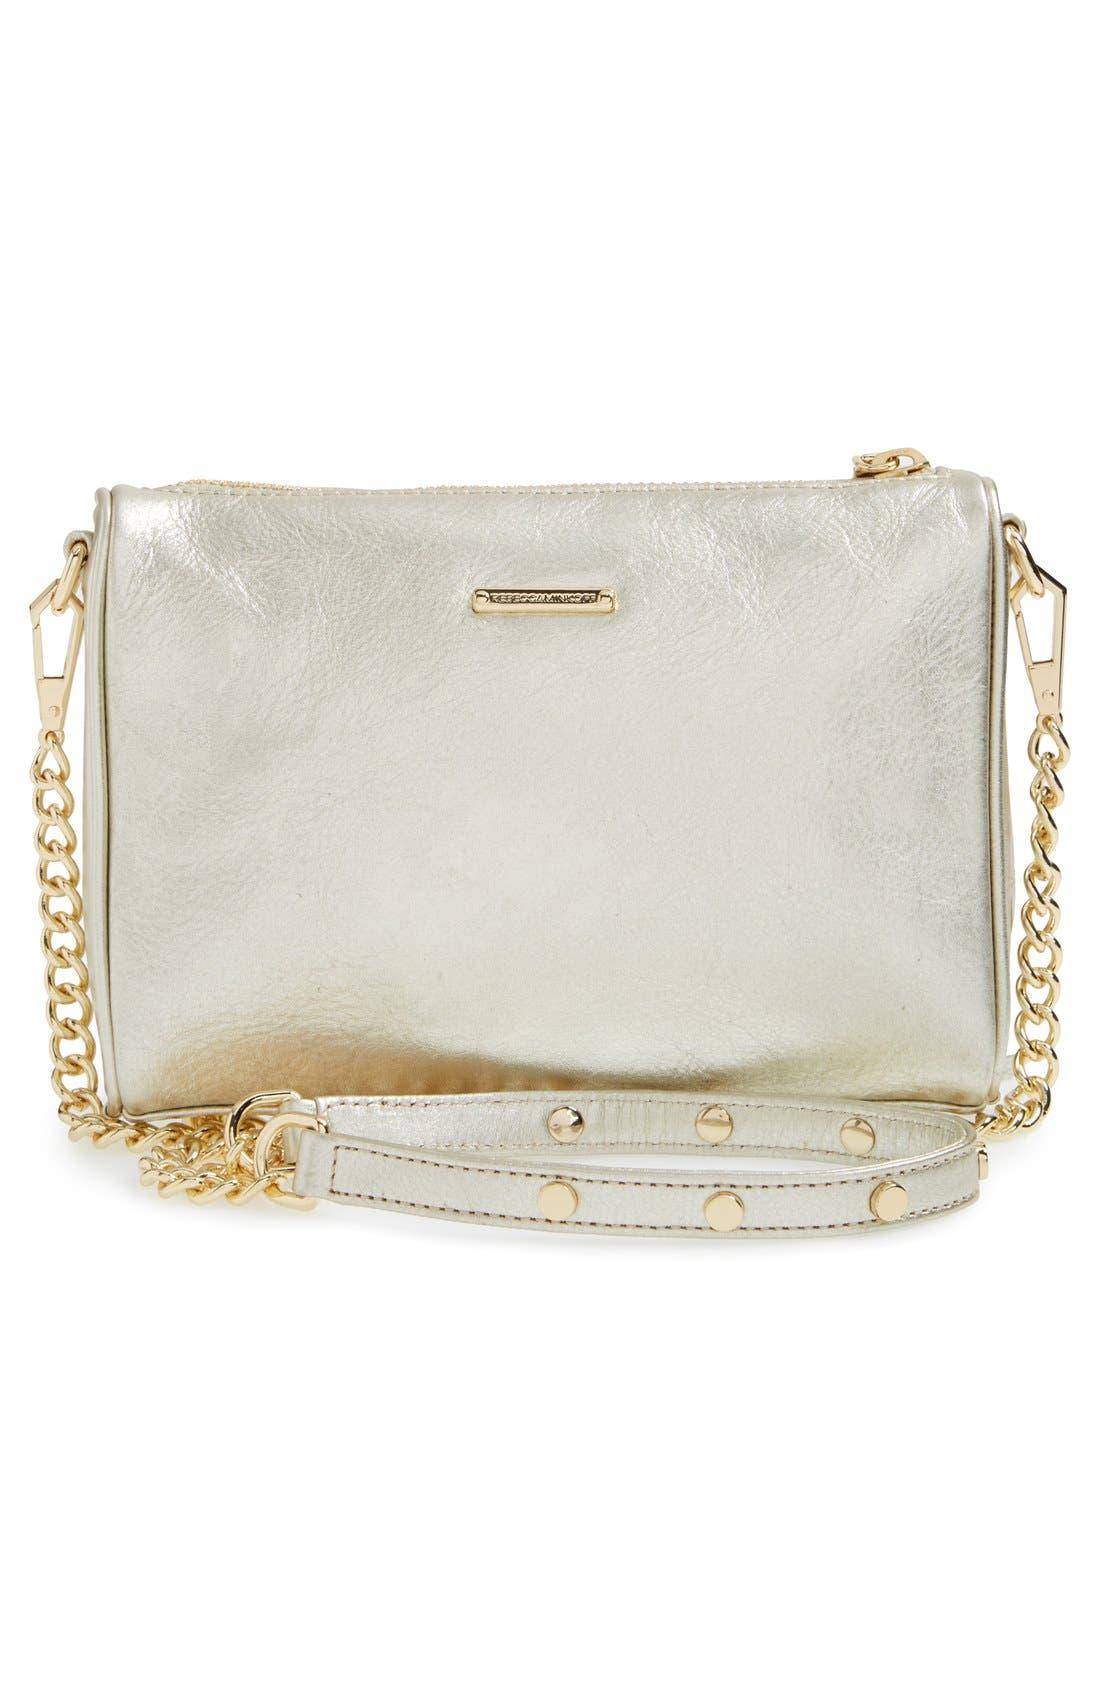 Alternate Image 3  - Rebecca Minkoff 'Mini 5 Zip' Crossbody Bag